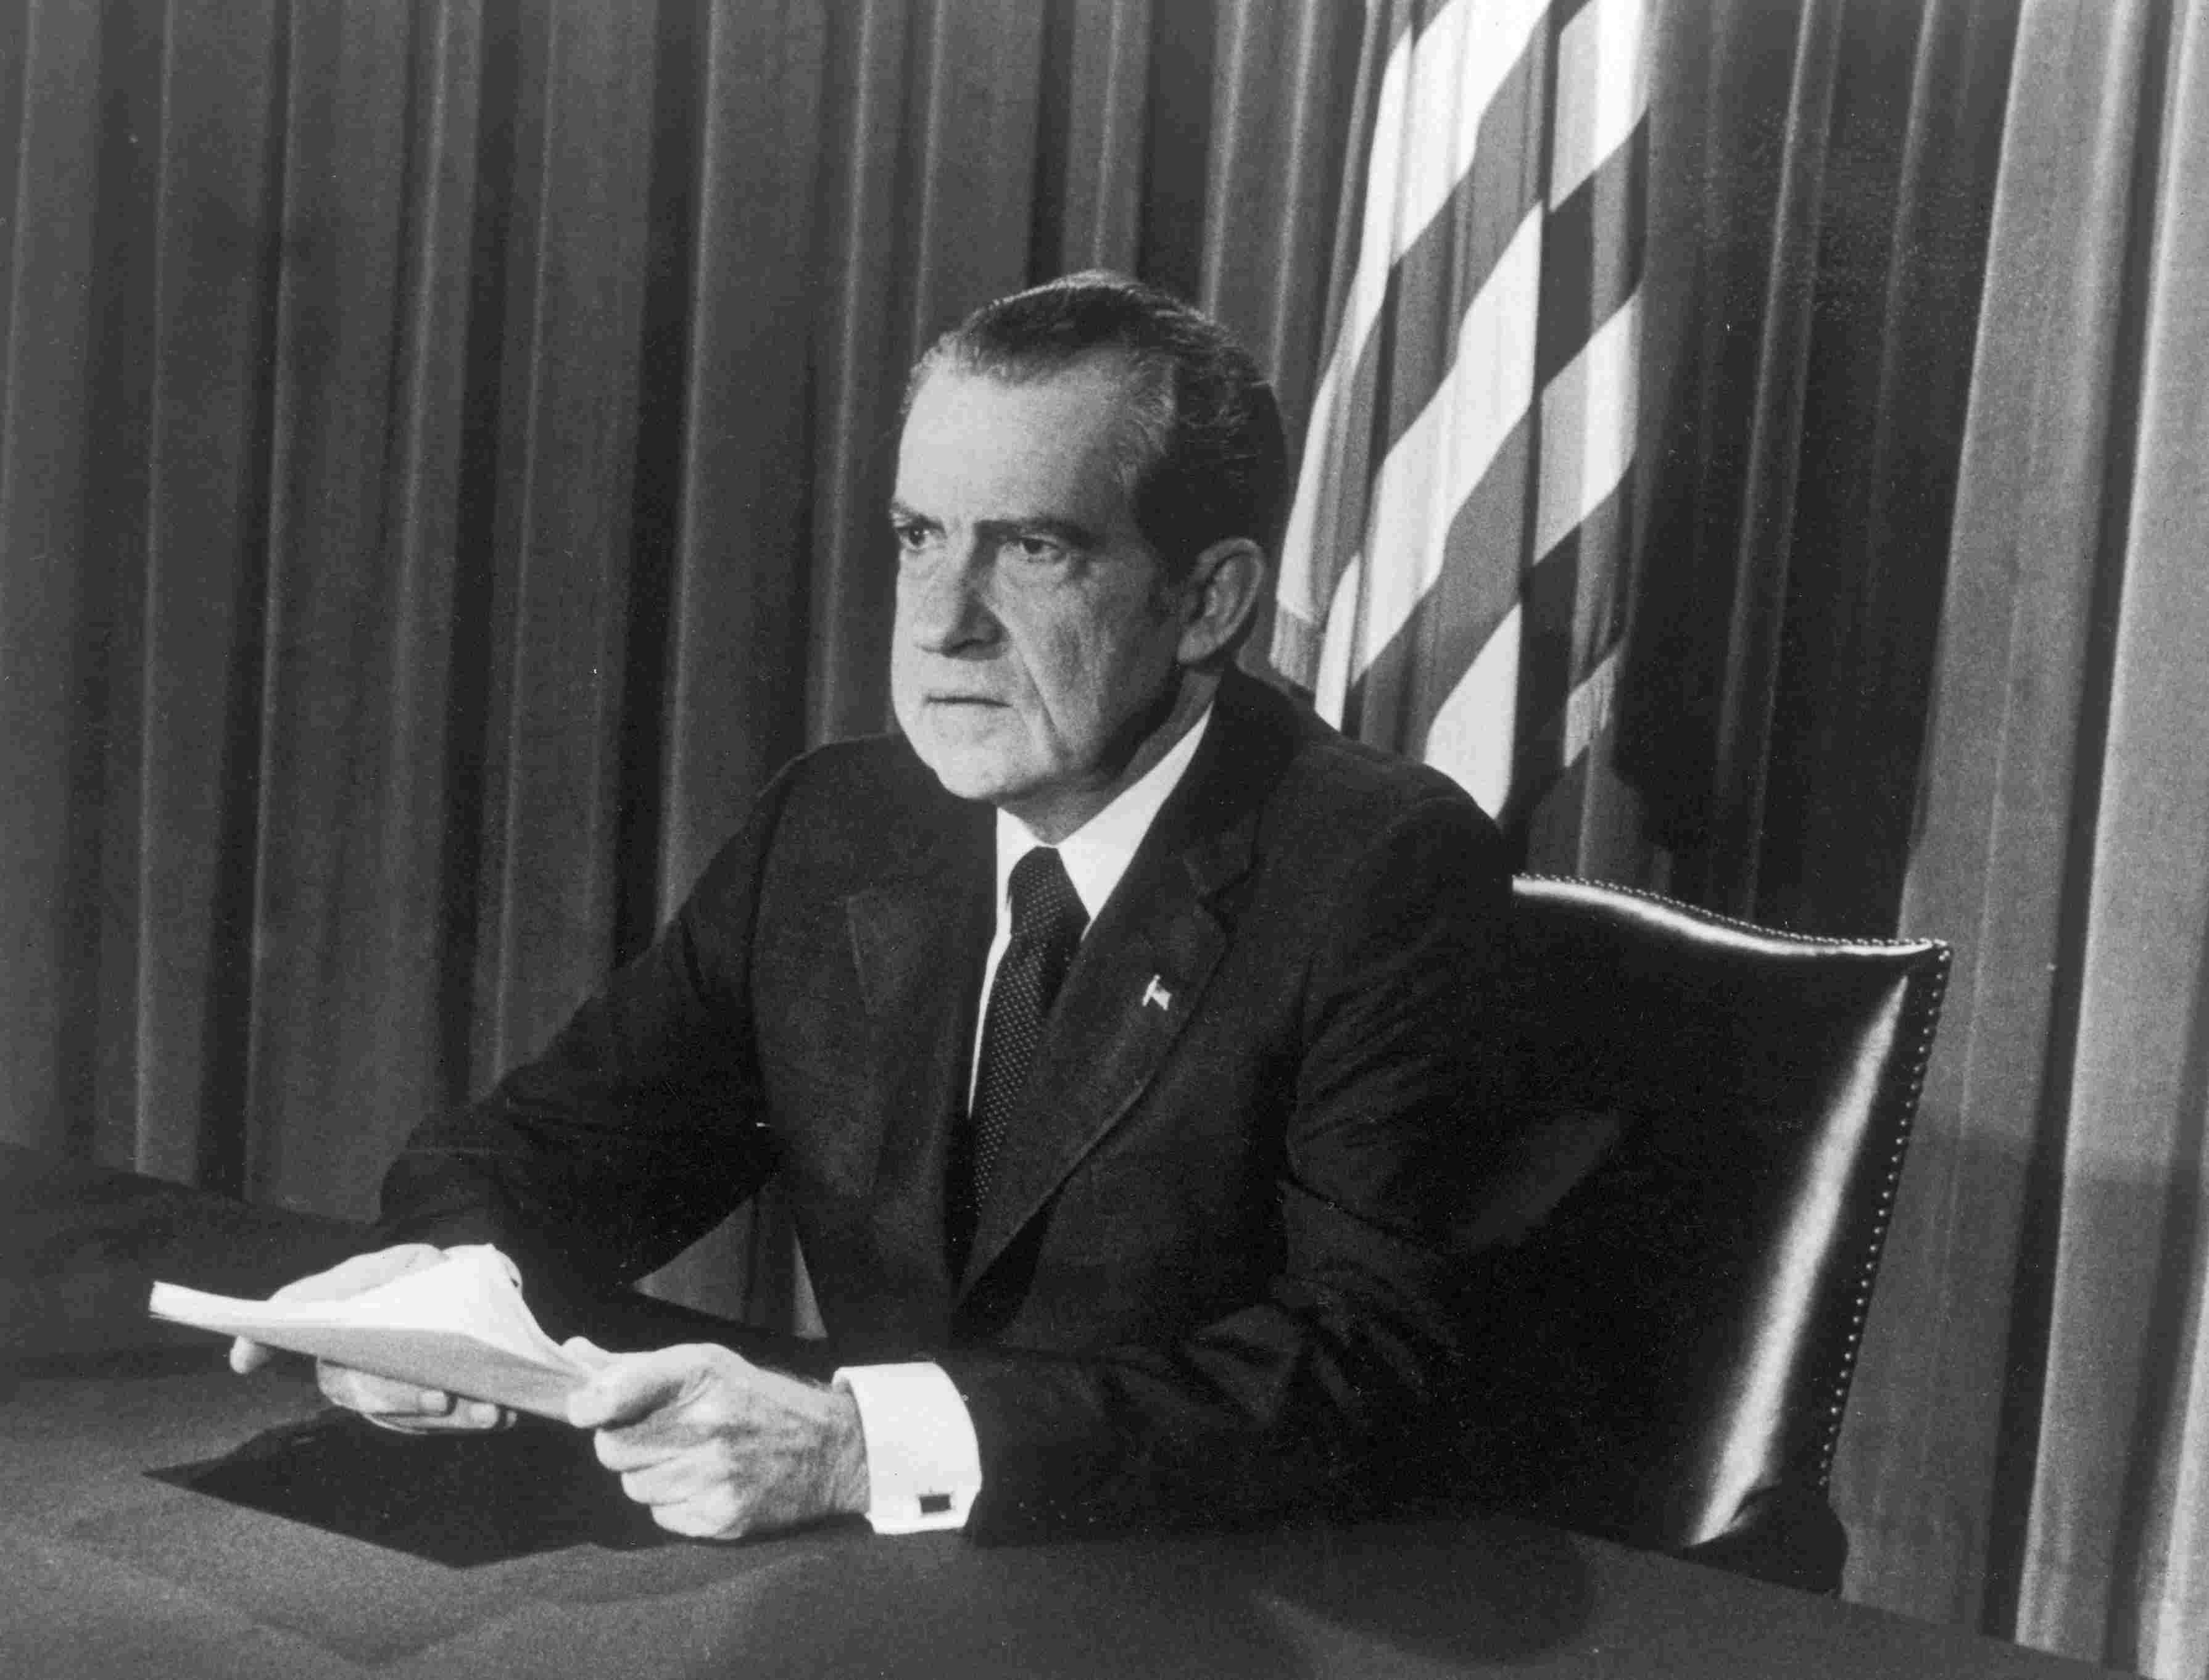 President Richard Nixon sits at his desk as he announces his resignation.